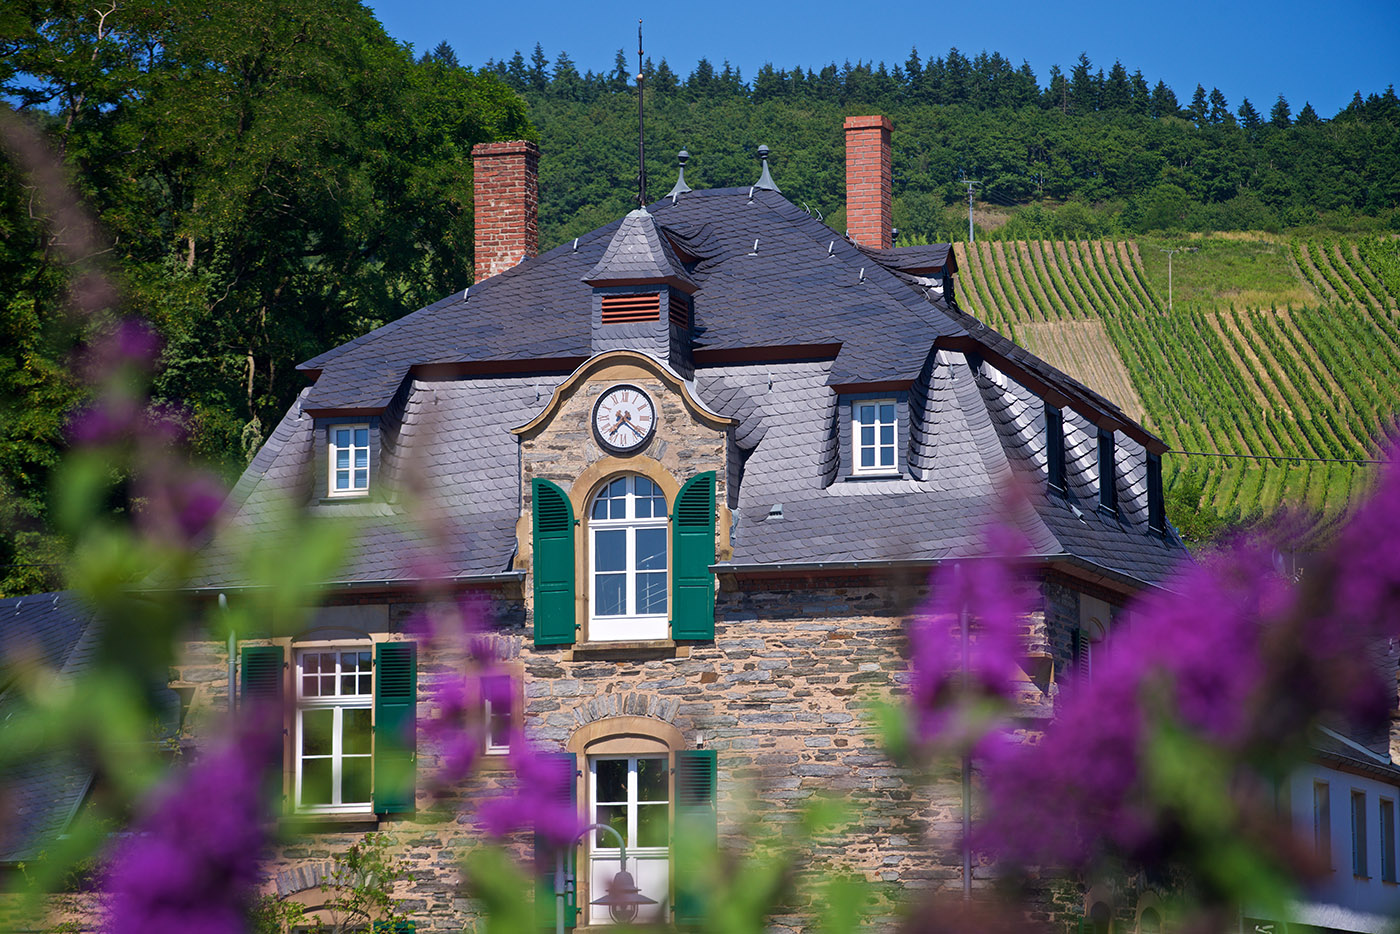 Architektur Fotografie an der Mosel, Weingut Schloss Lieser, Schieferdach. Kunde: Dachdecker Herges